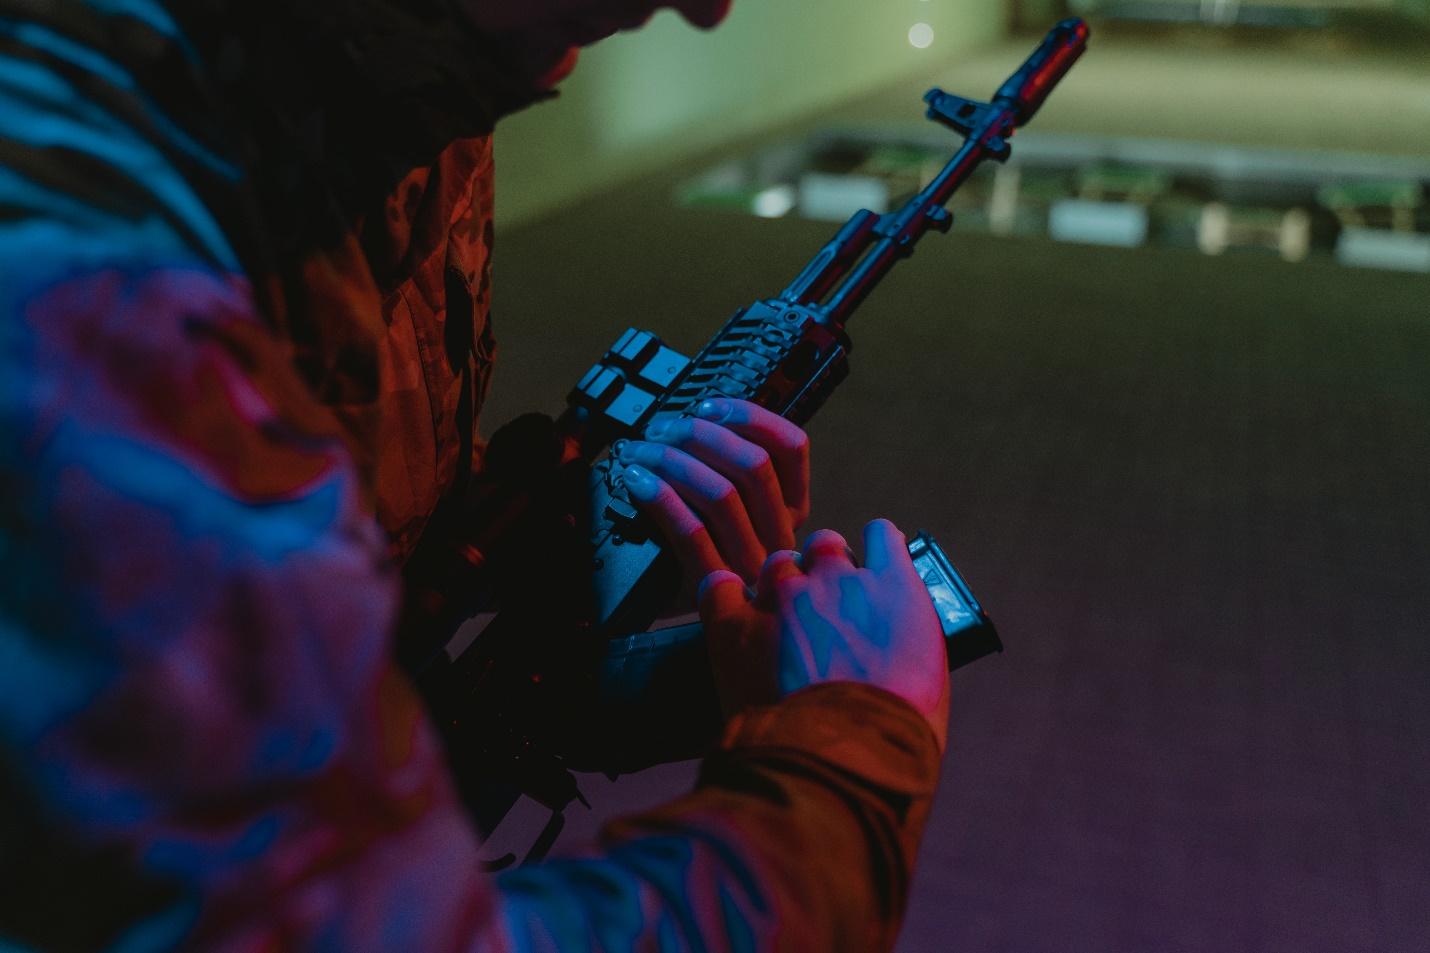 Man holding a gun at a shooting range